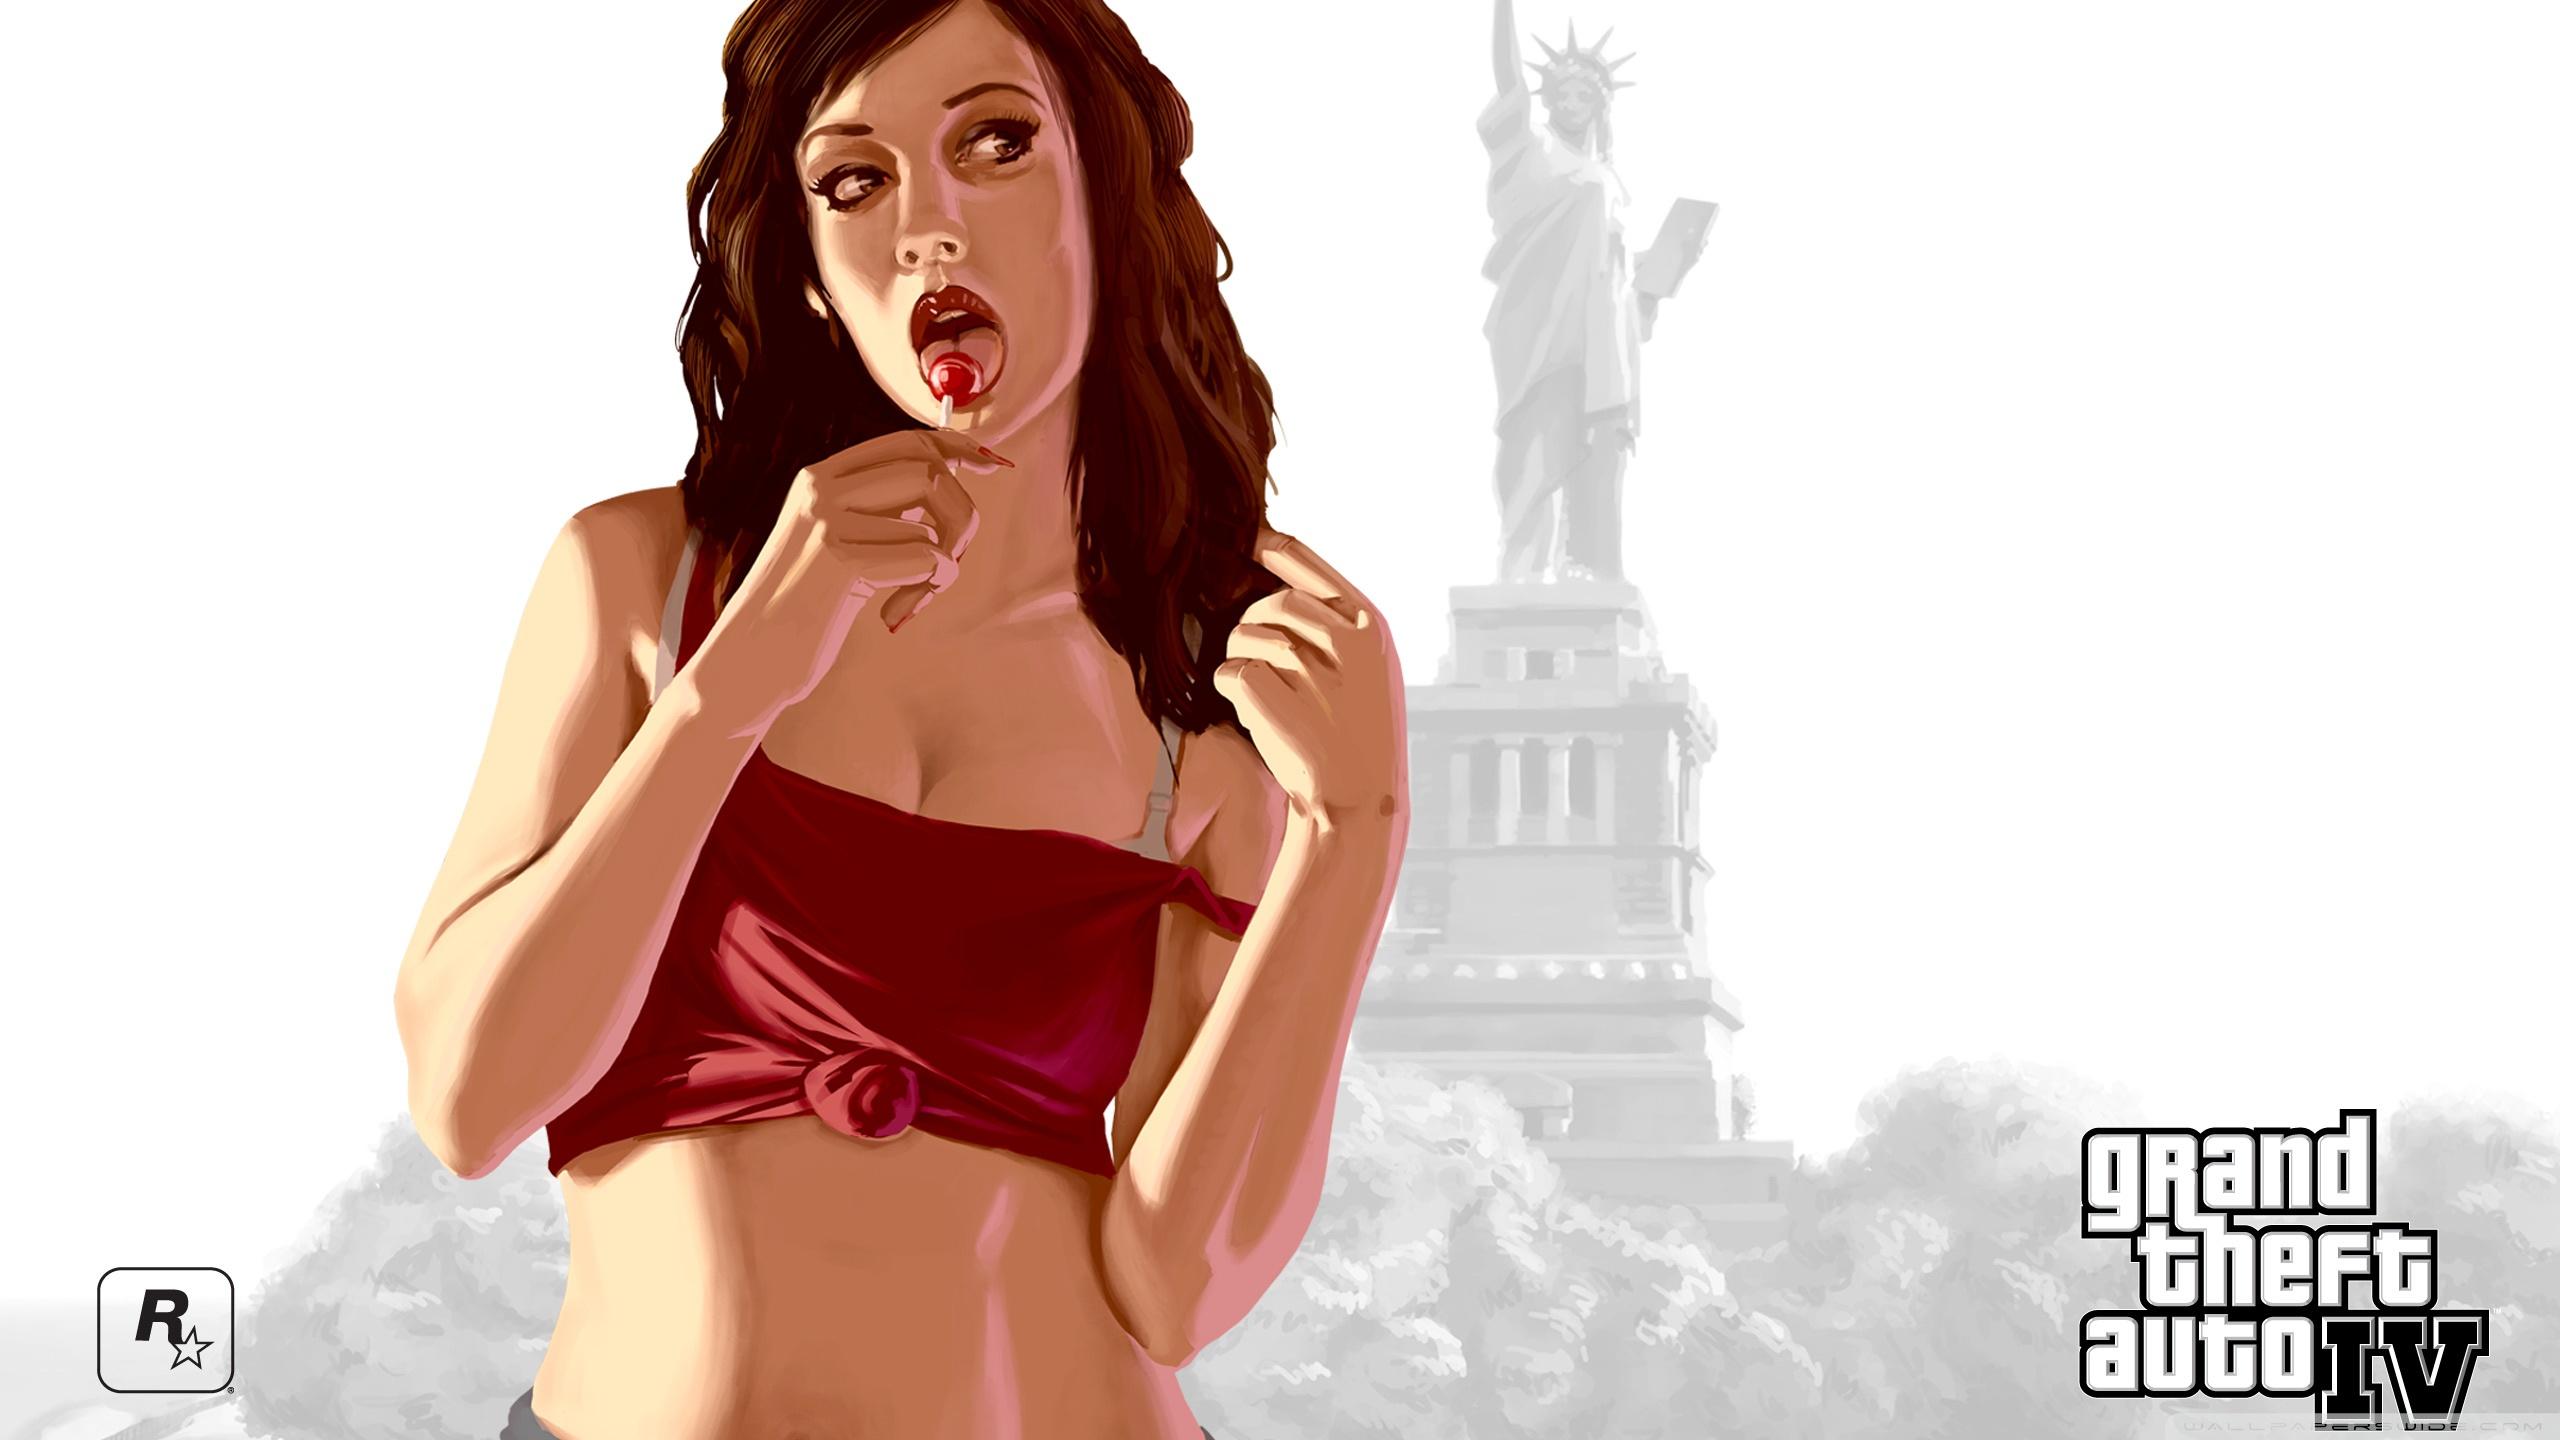 nacked girls shacking their boobs